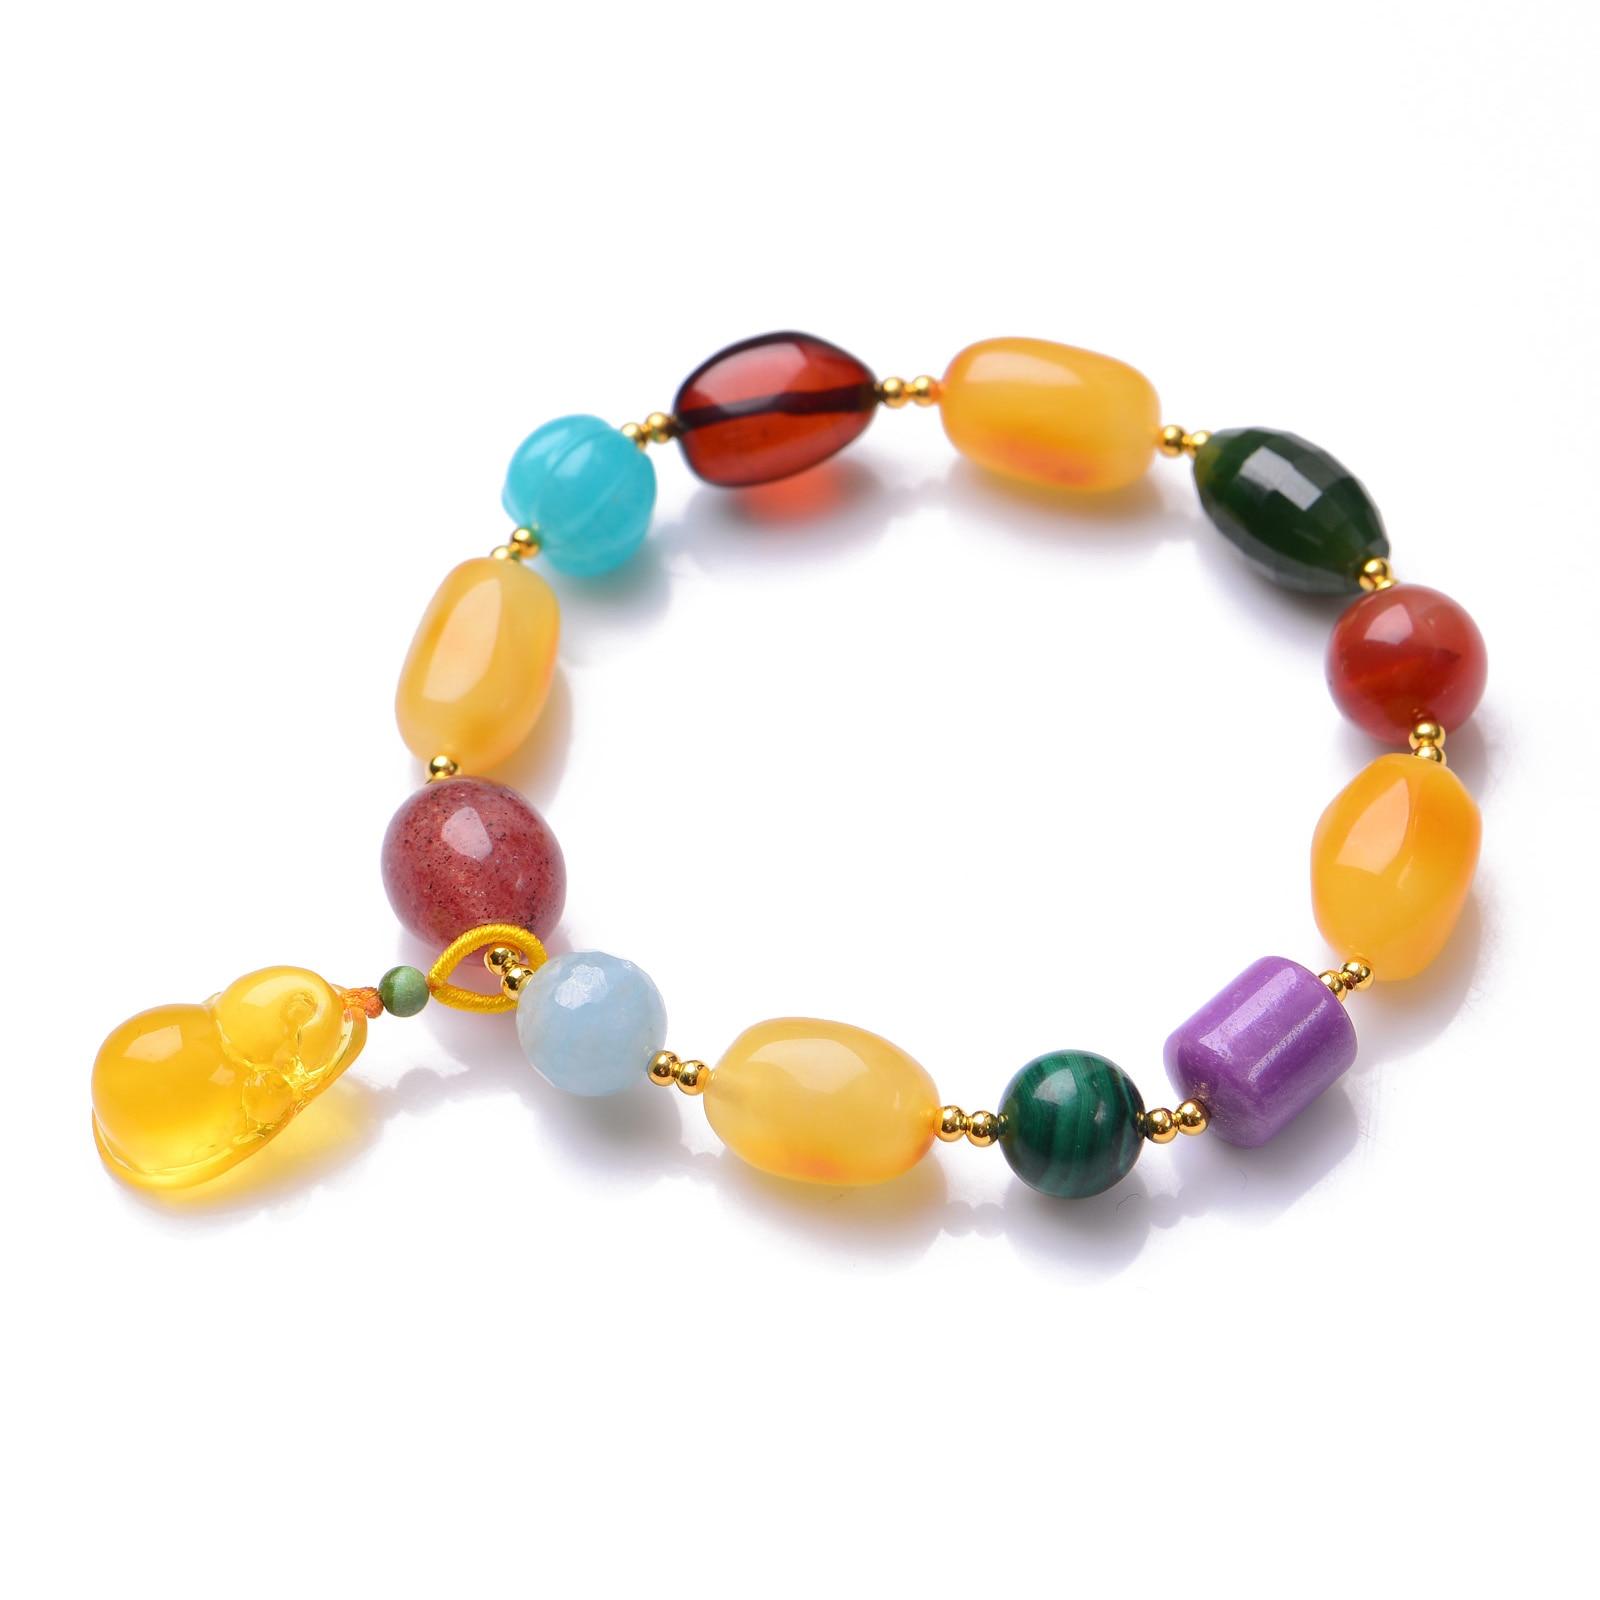 Handmade Authentic Multi Crystal Bracelets handmade authentic multi crystal bracelets